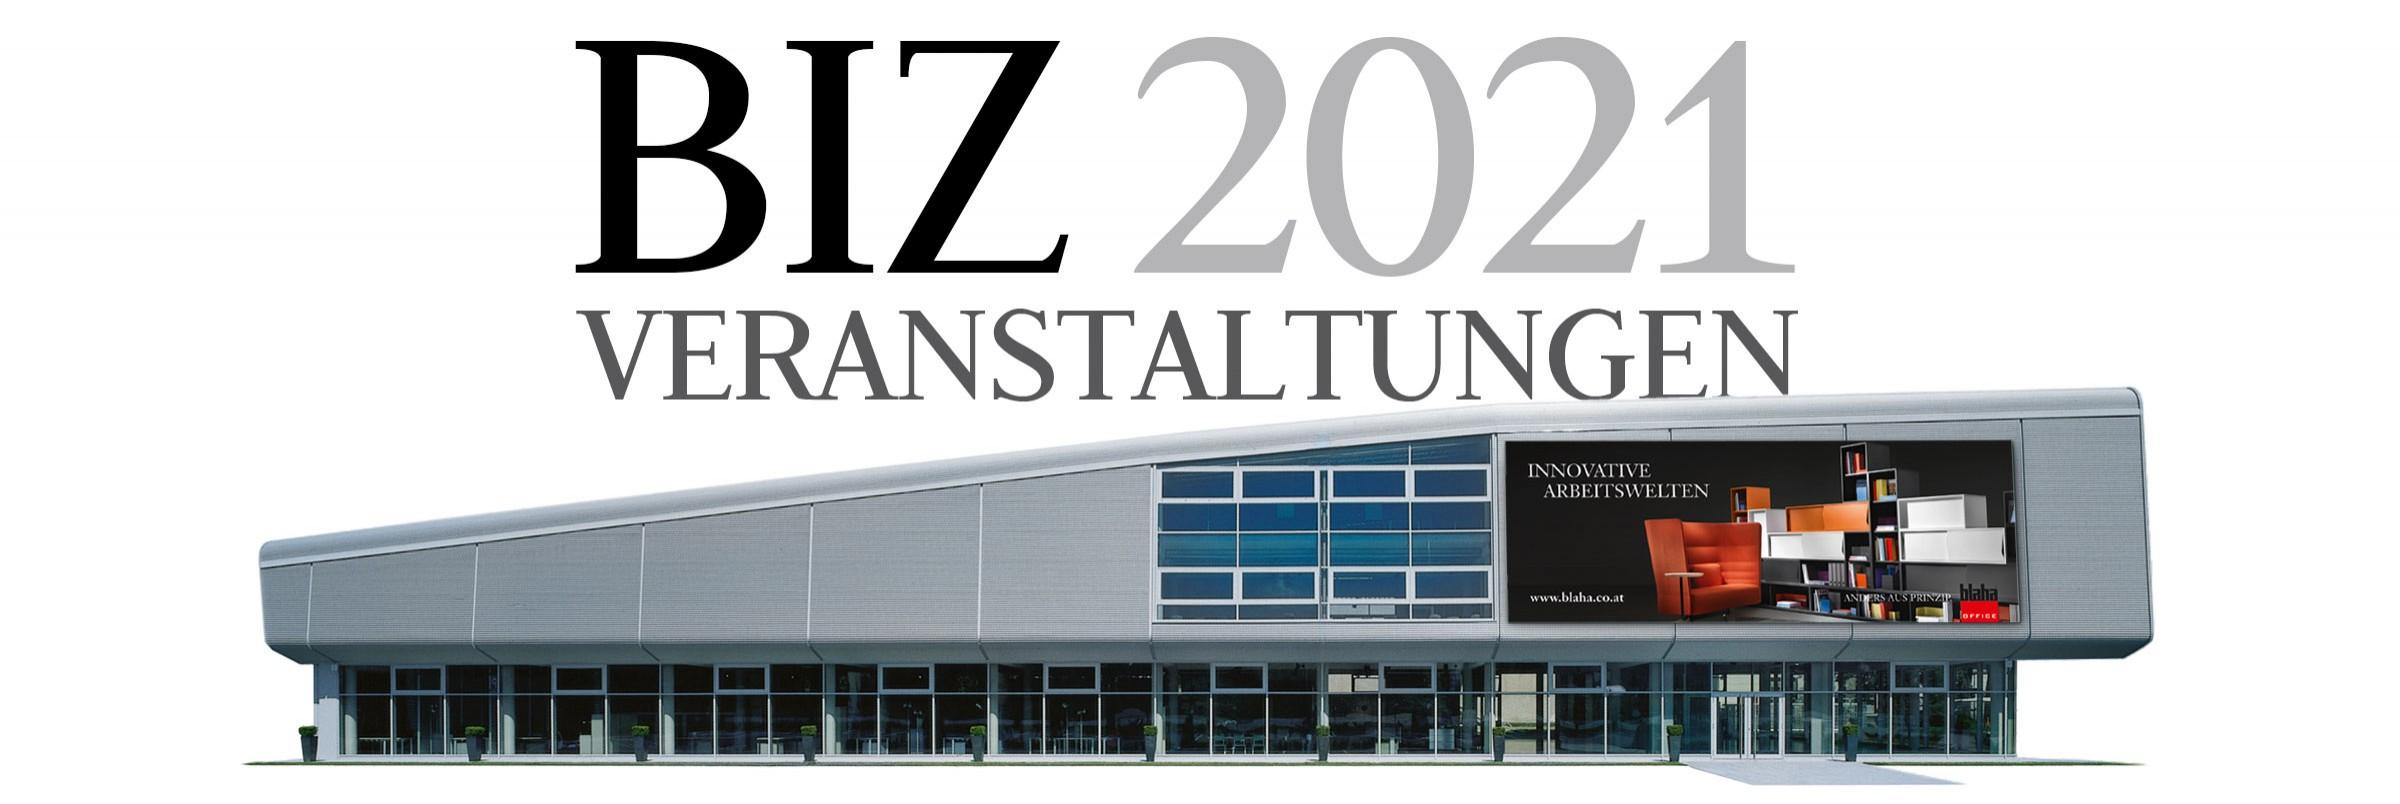 biz 2021 blaha buero office veranstaltungen